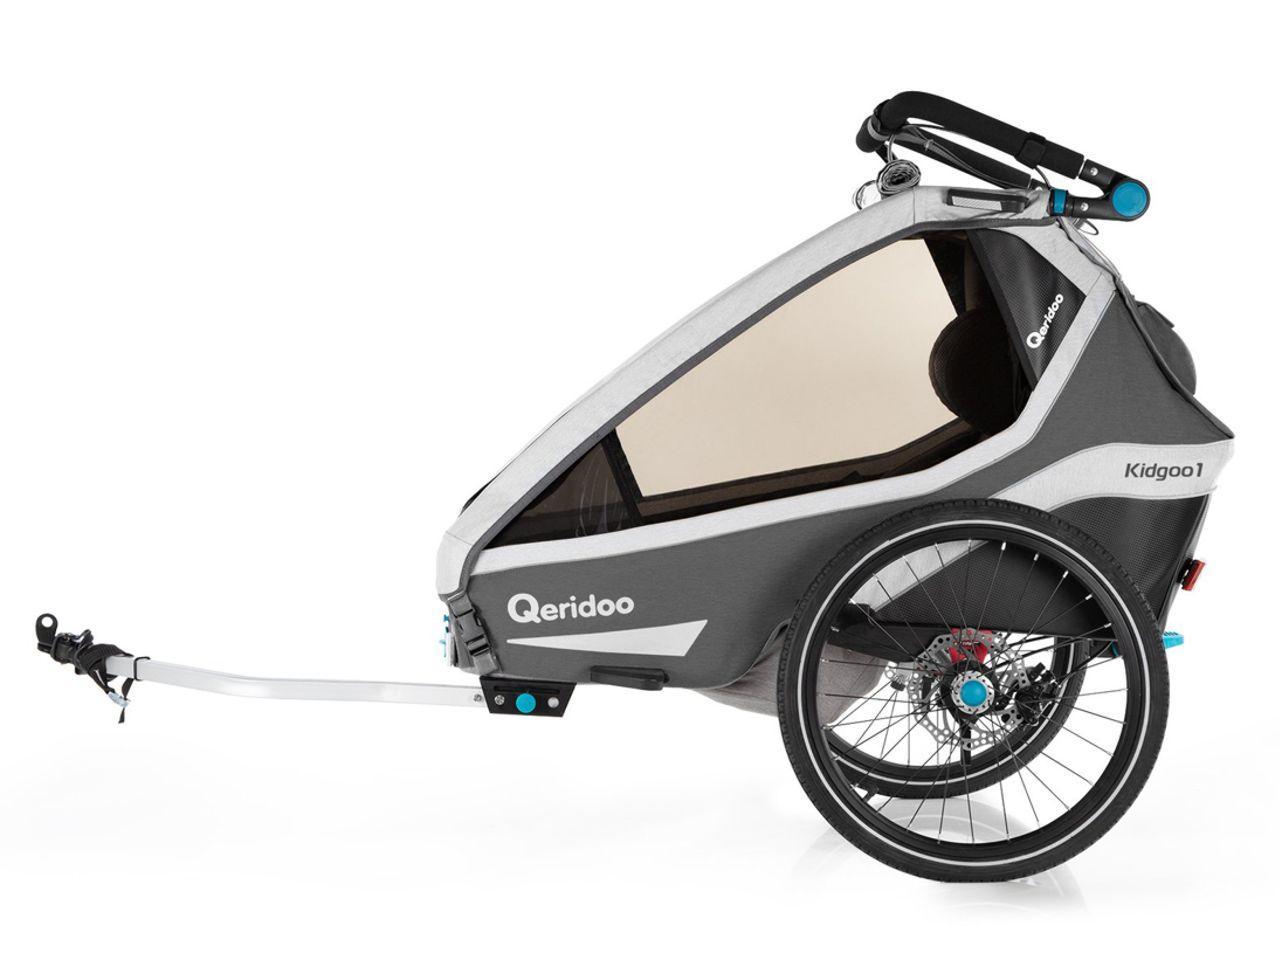 Cyklistický vozík QERIDOO KidGoo 1 Sport, antracit + AKCE CASHBACK 10%